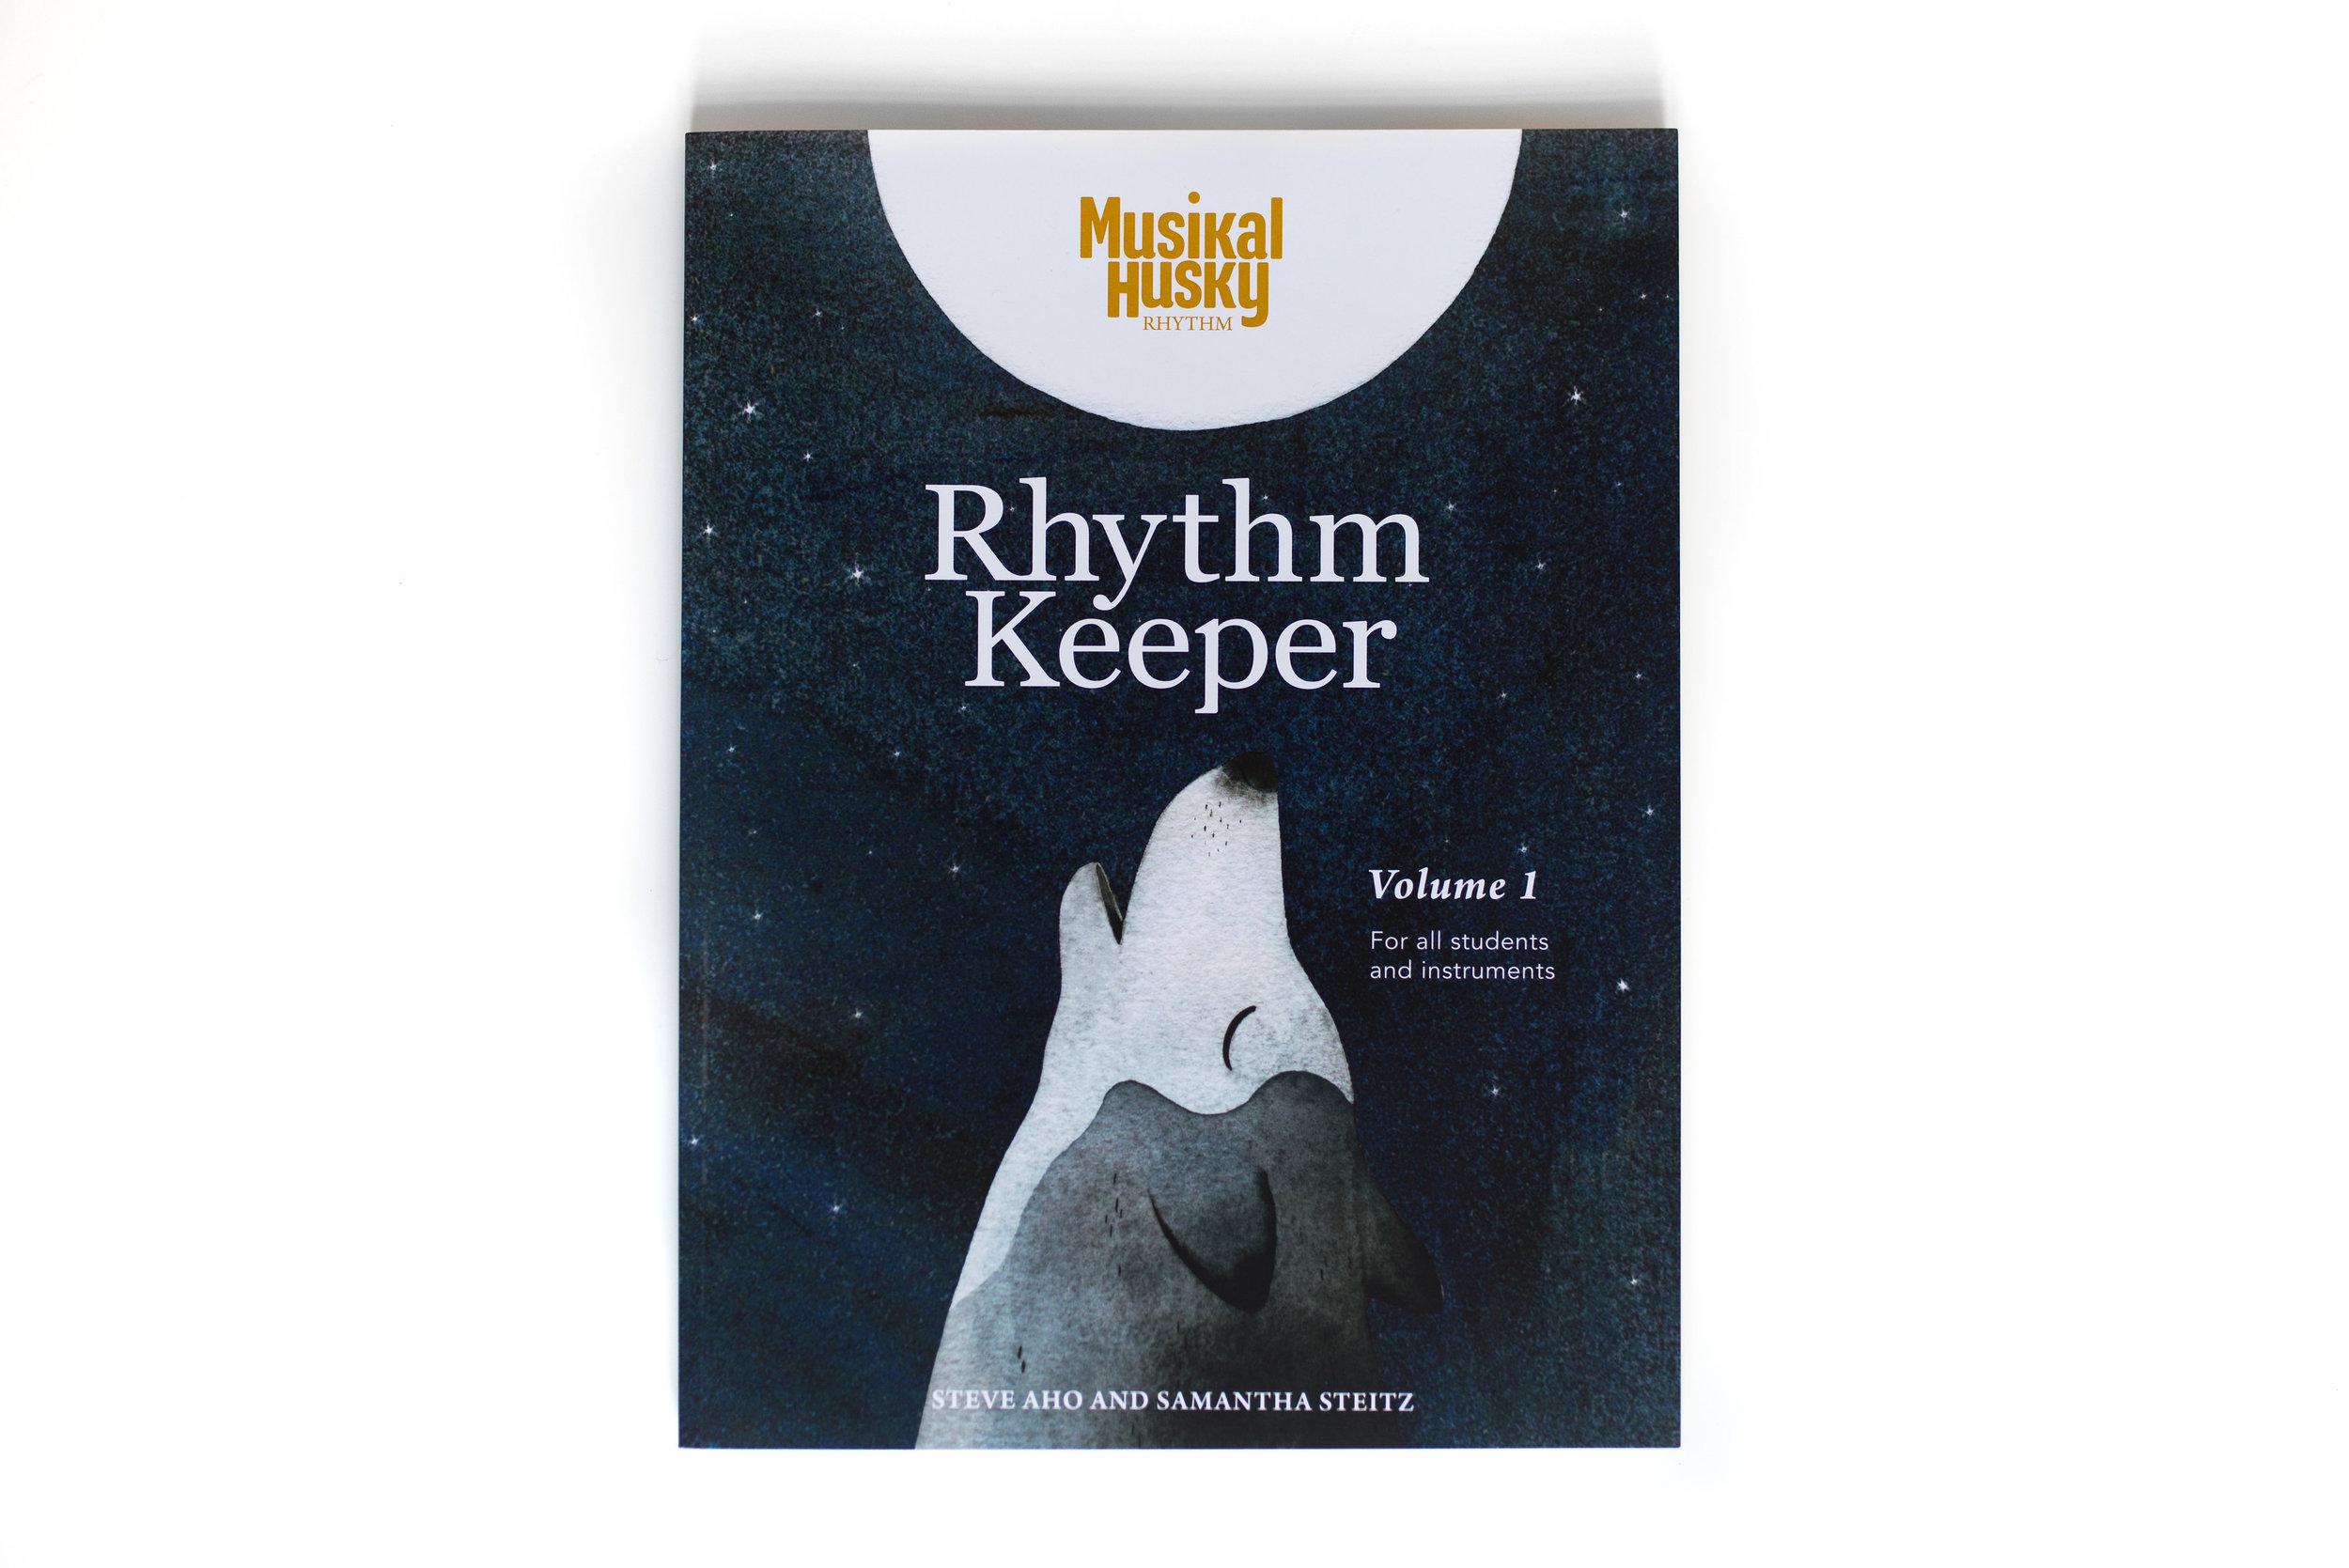 RhythmKeeper-7.jpg